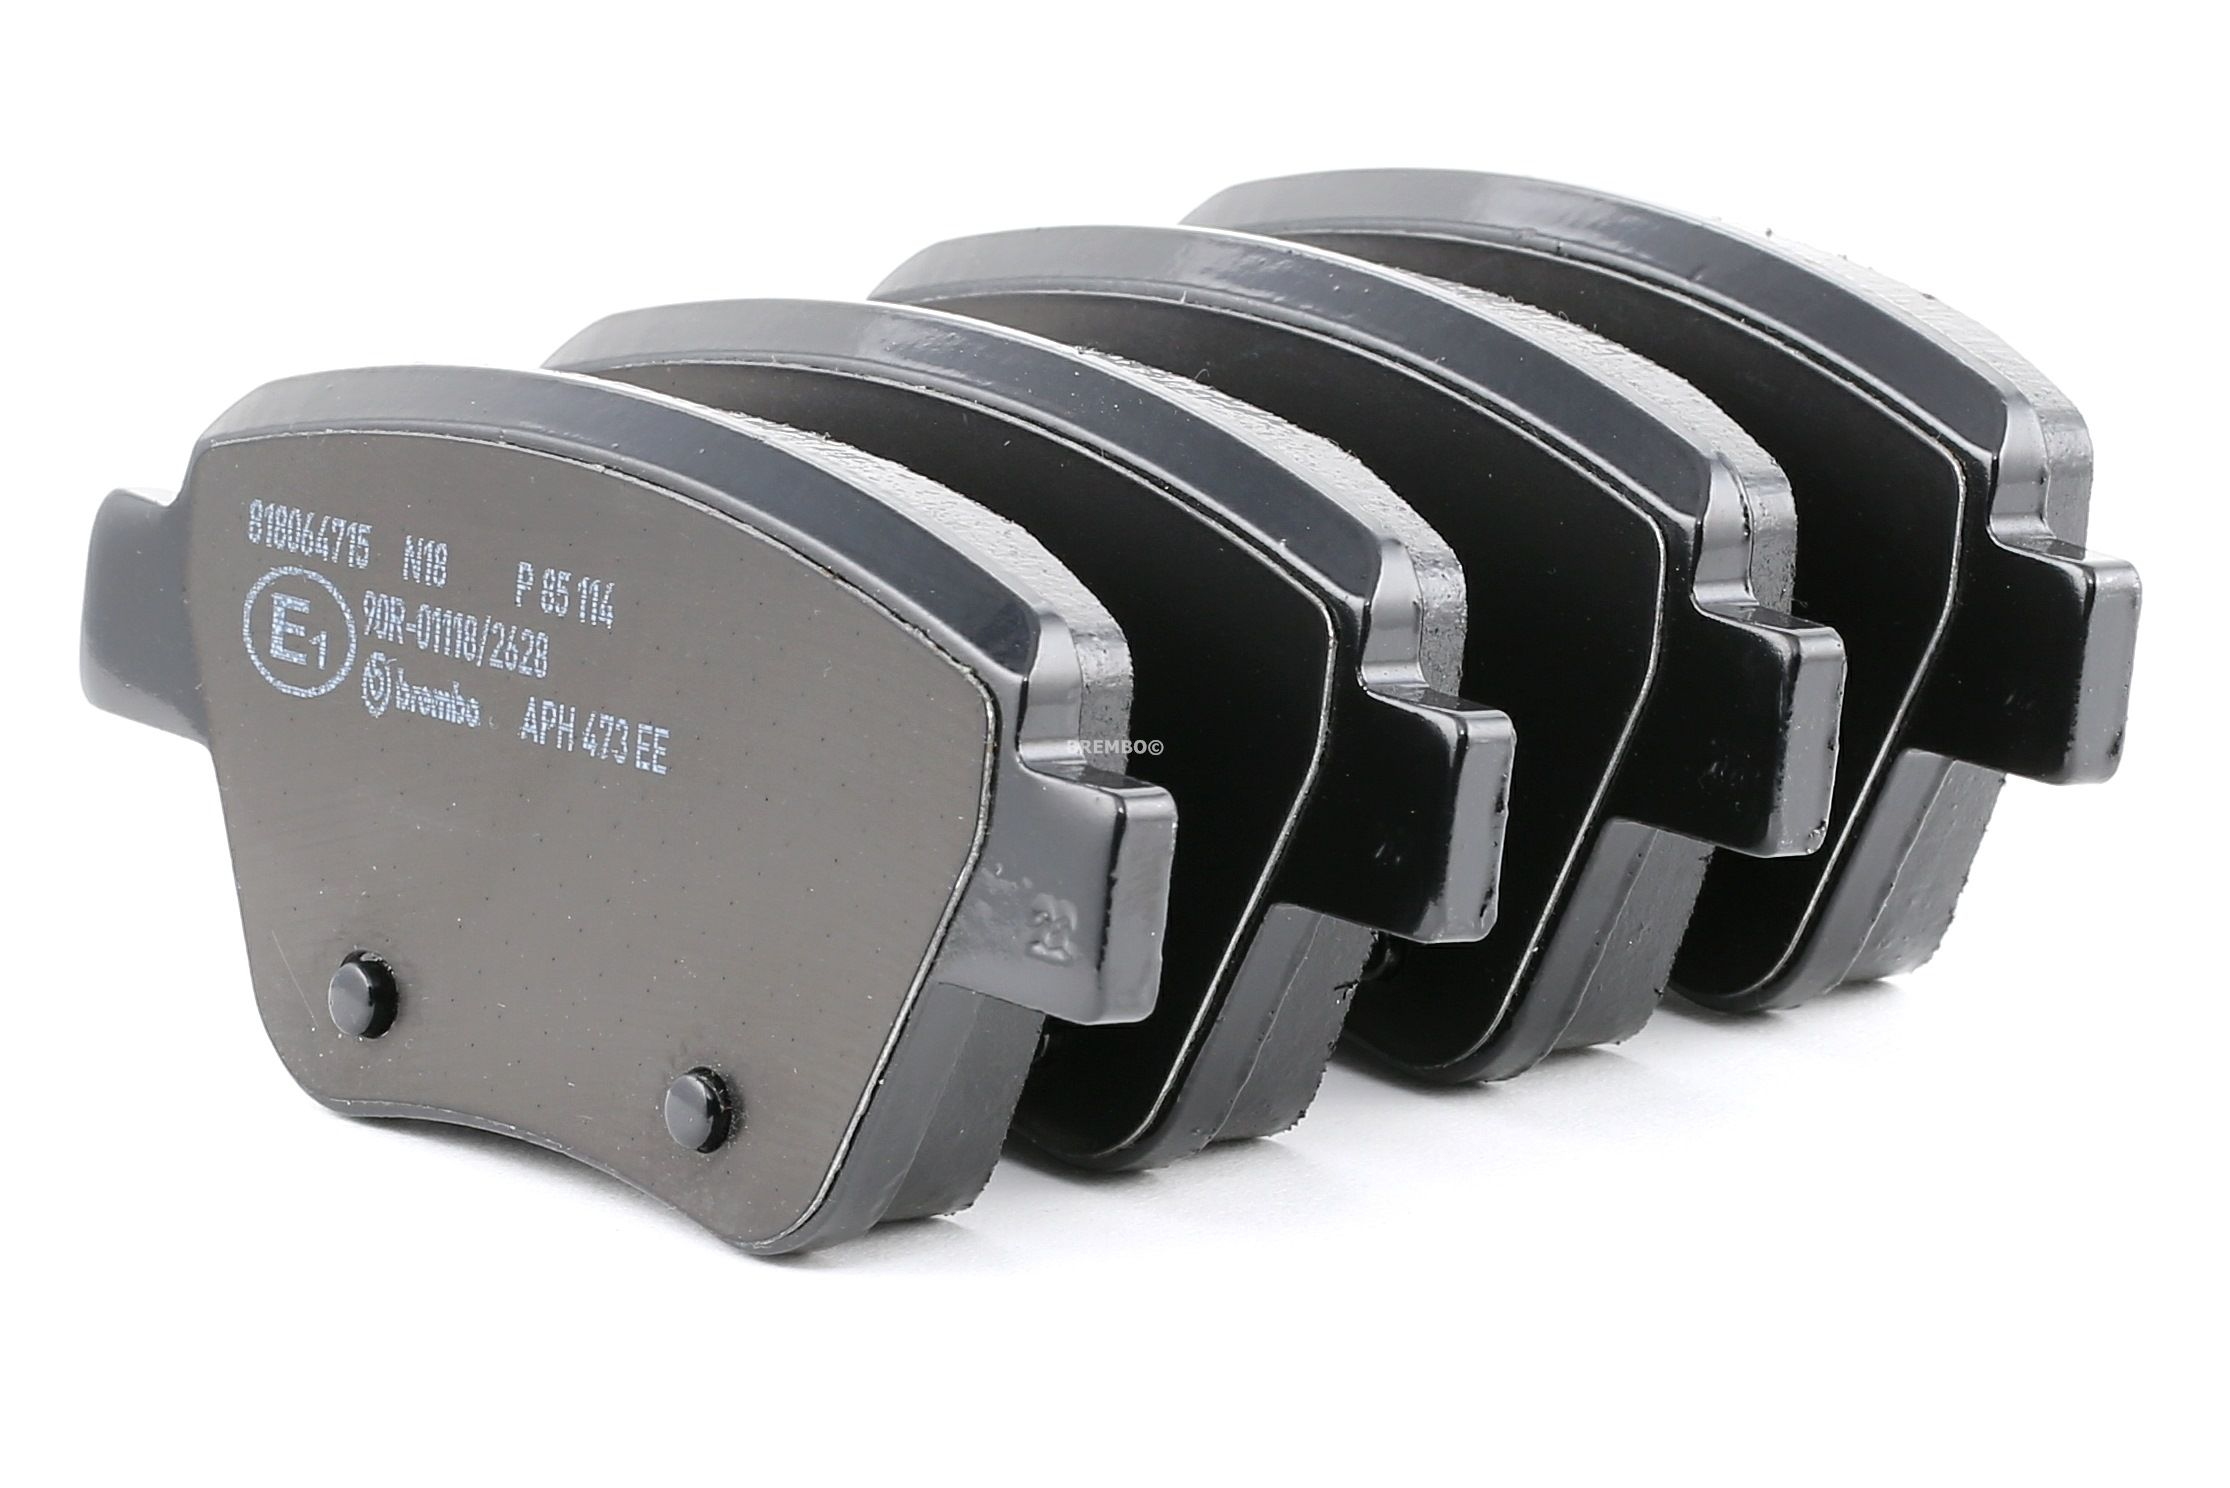 Buy original Brake pad set disc brake BREMBO P 85 114